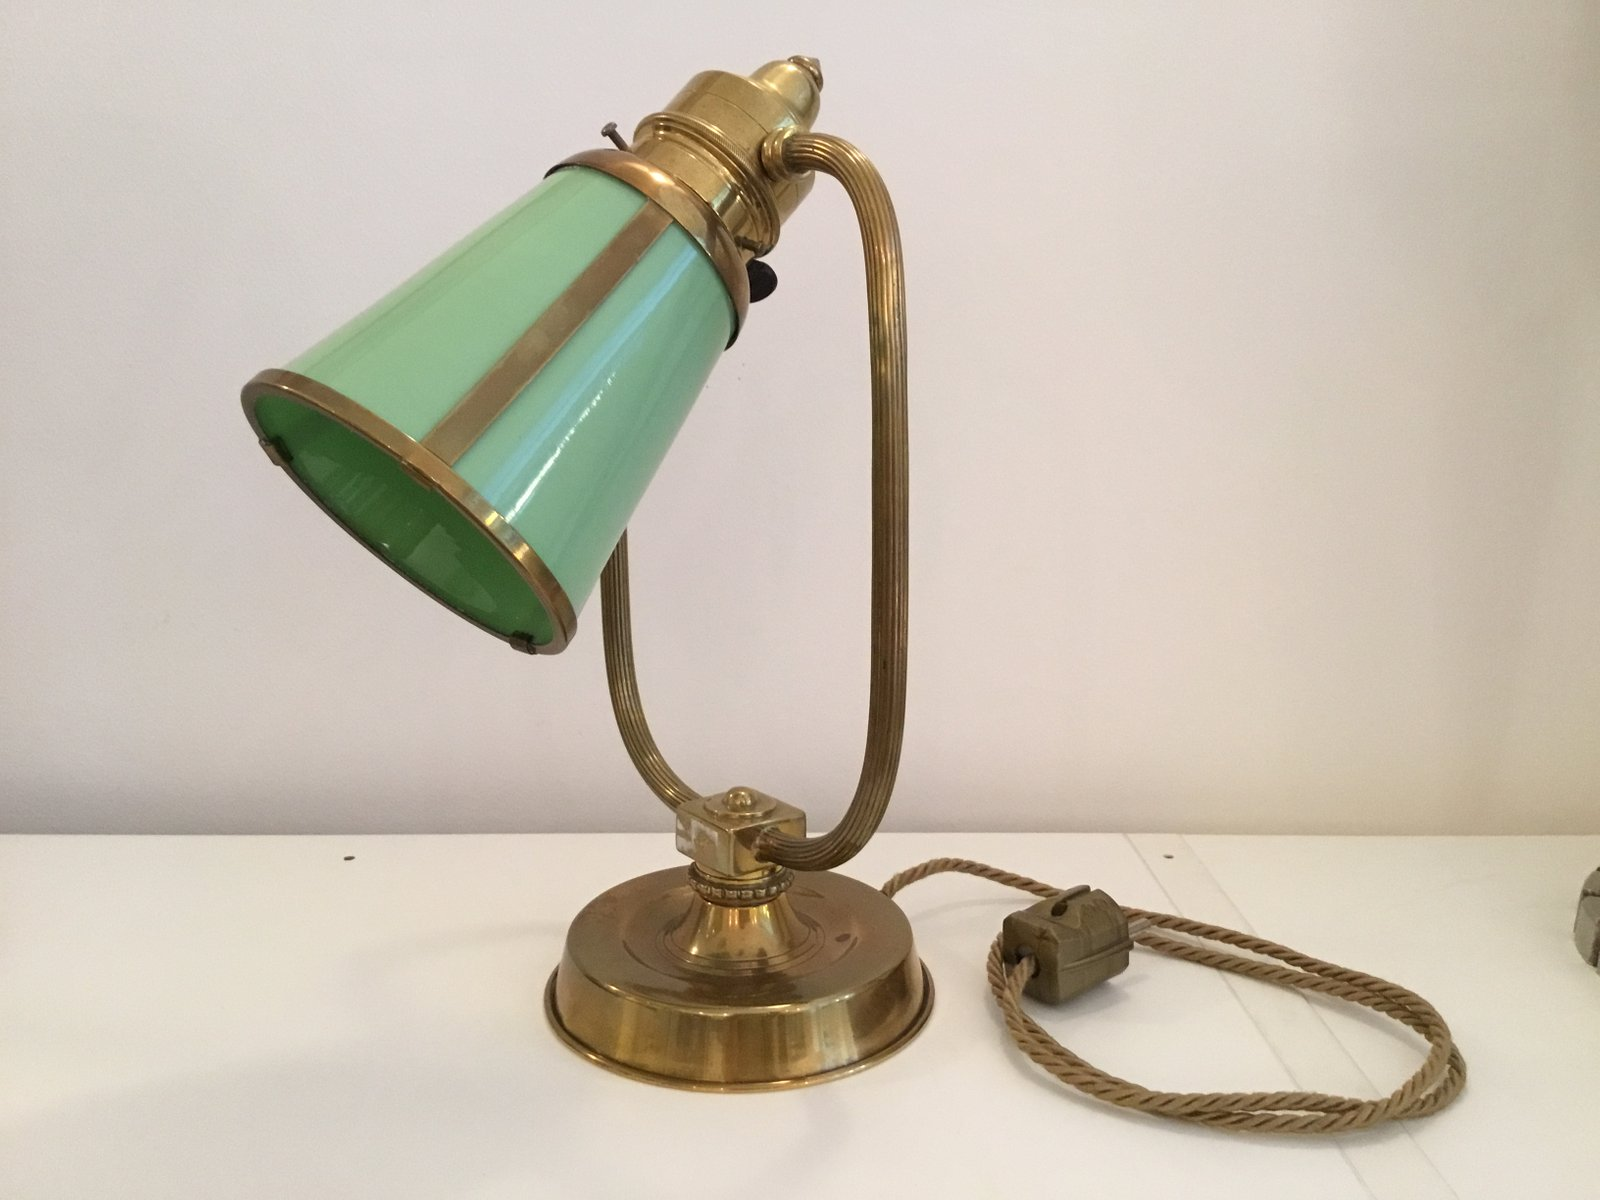 Französische Jugendstil Tischlampe, 1900er